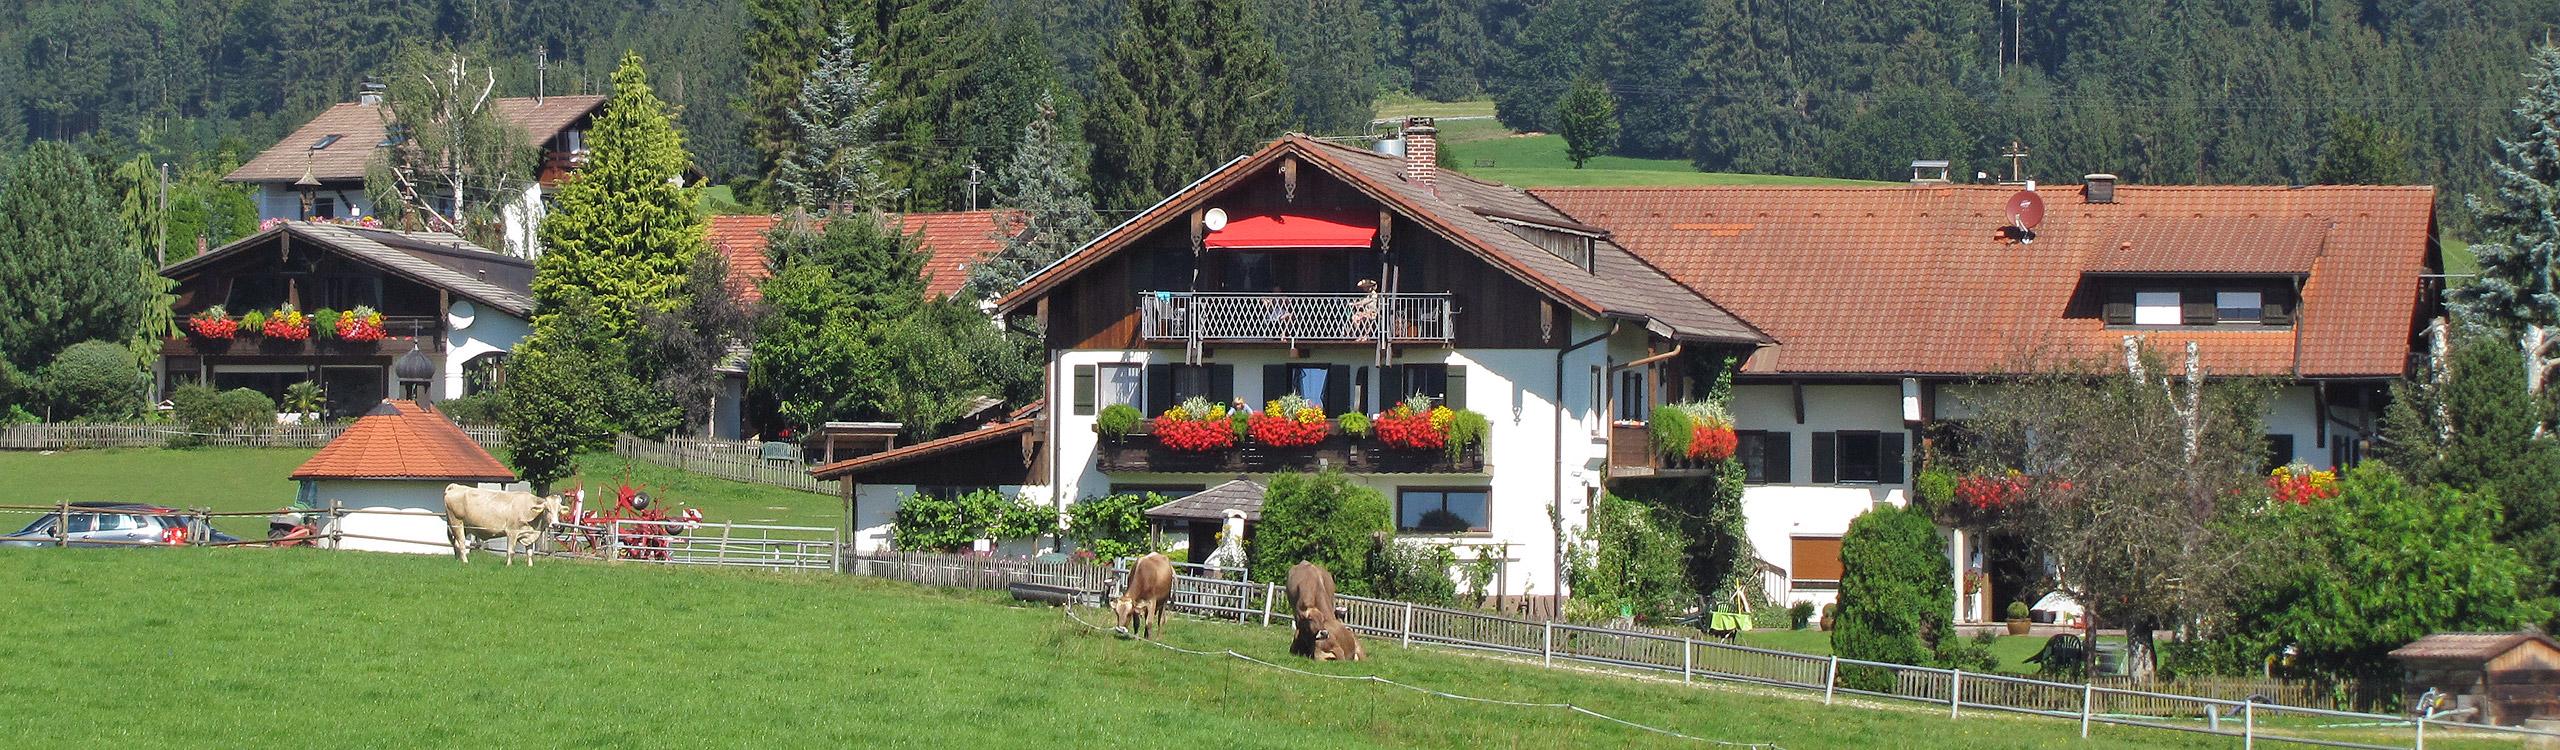 Alpenseehof :: Bauernhofurlaub im Allgäu